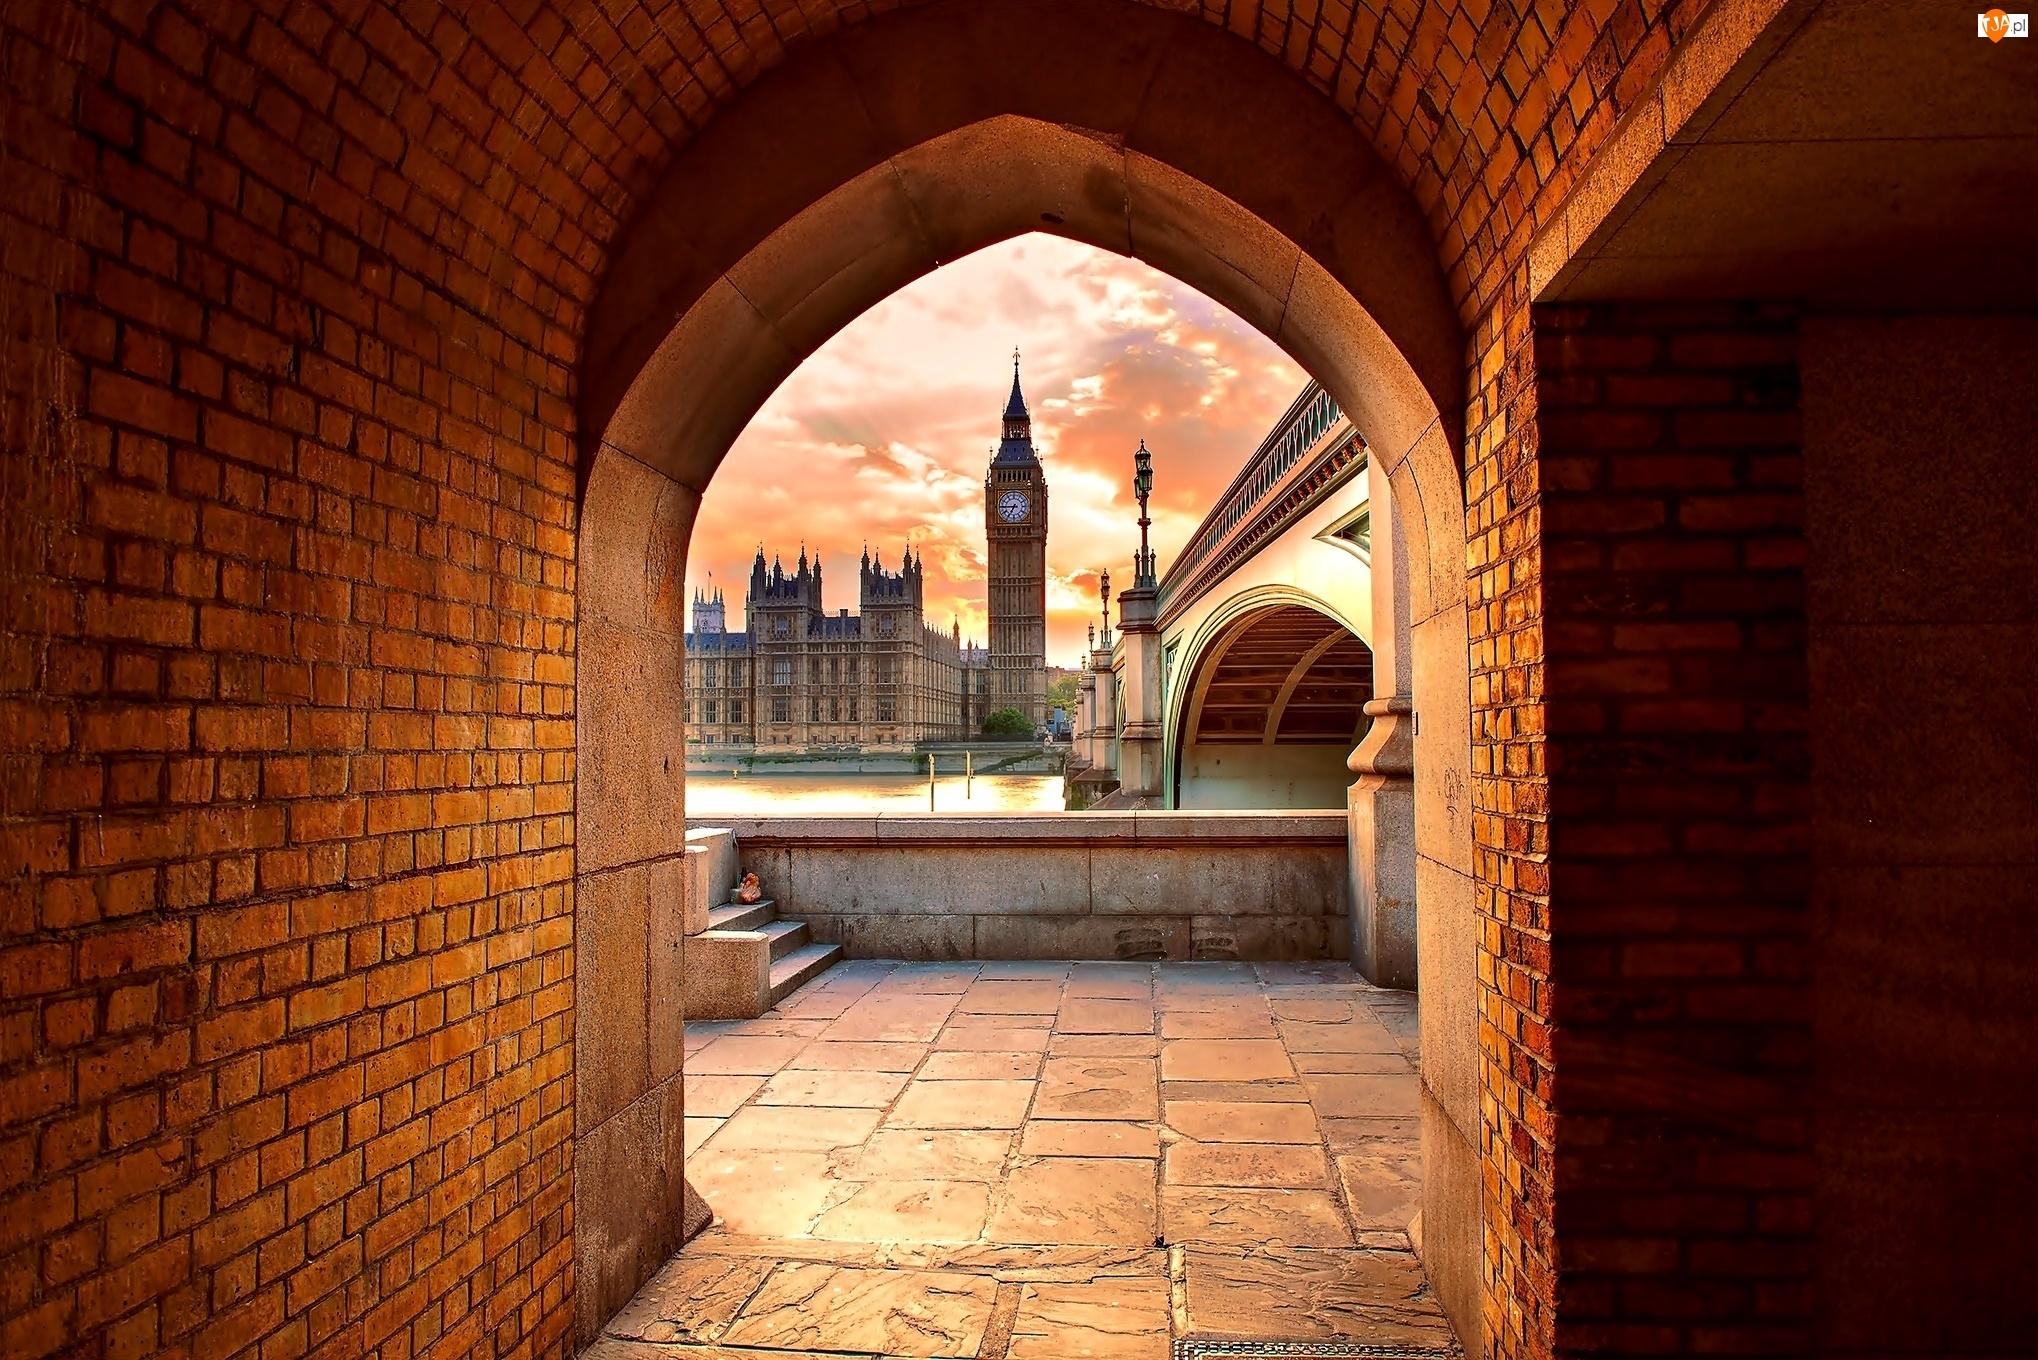 Tunel, Wielka Brytania, Big Ben, Londyn, Pałac Westminster